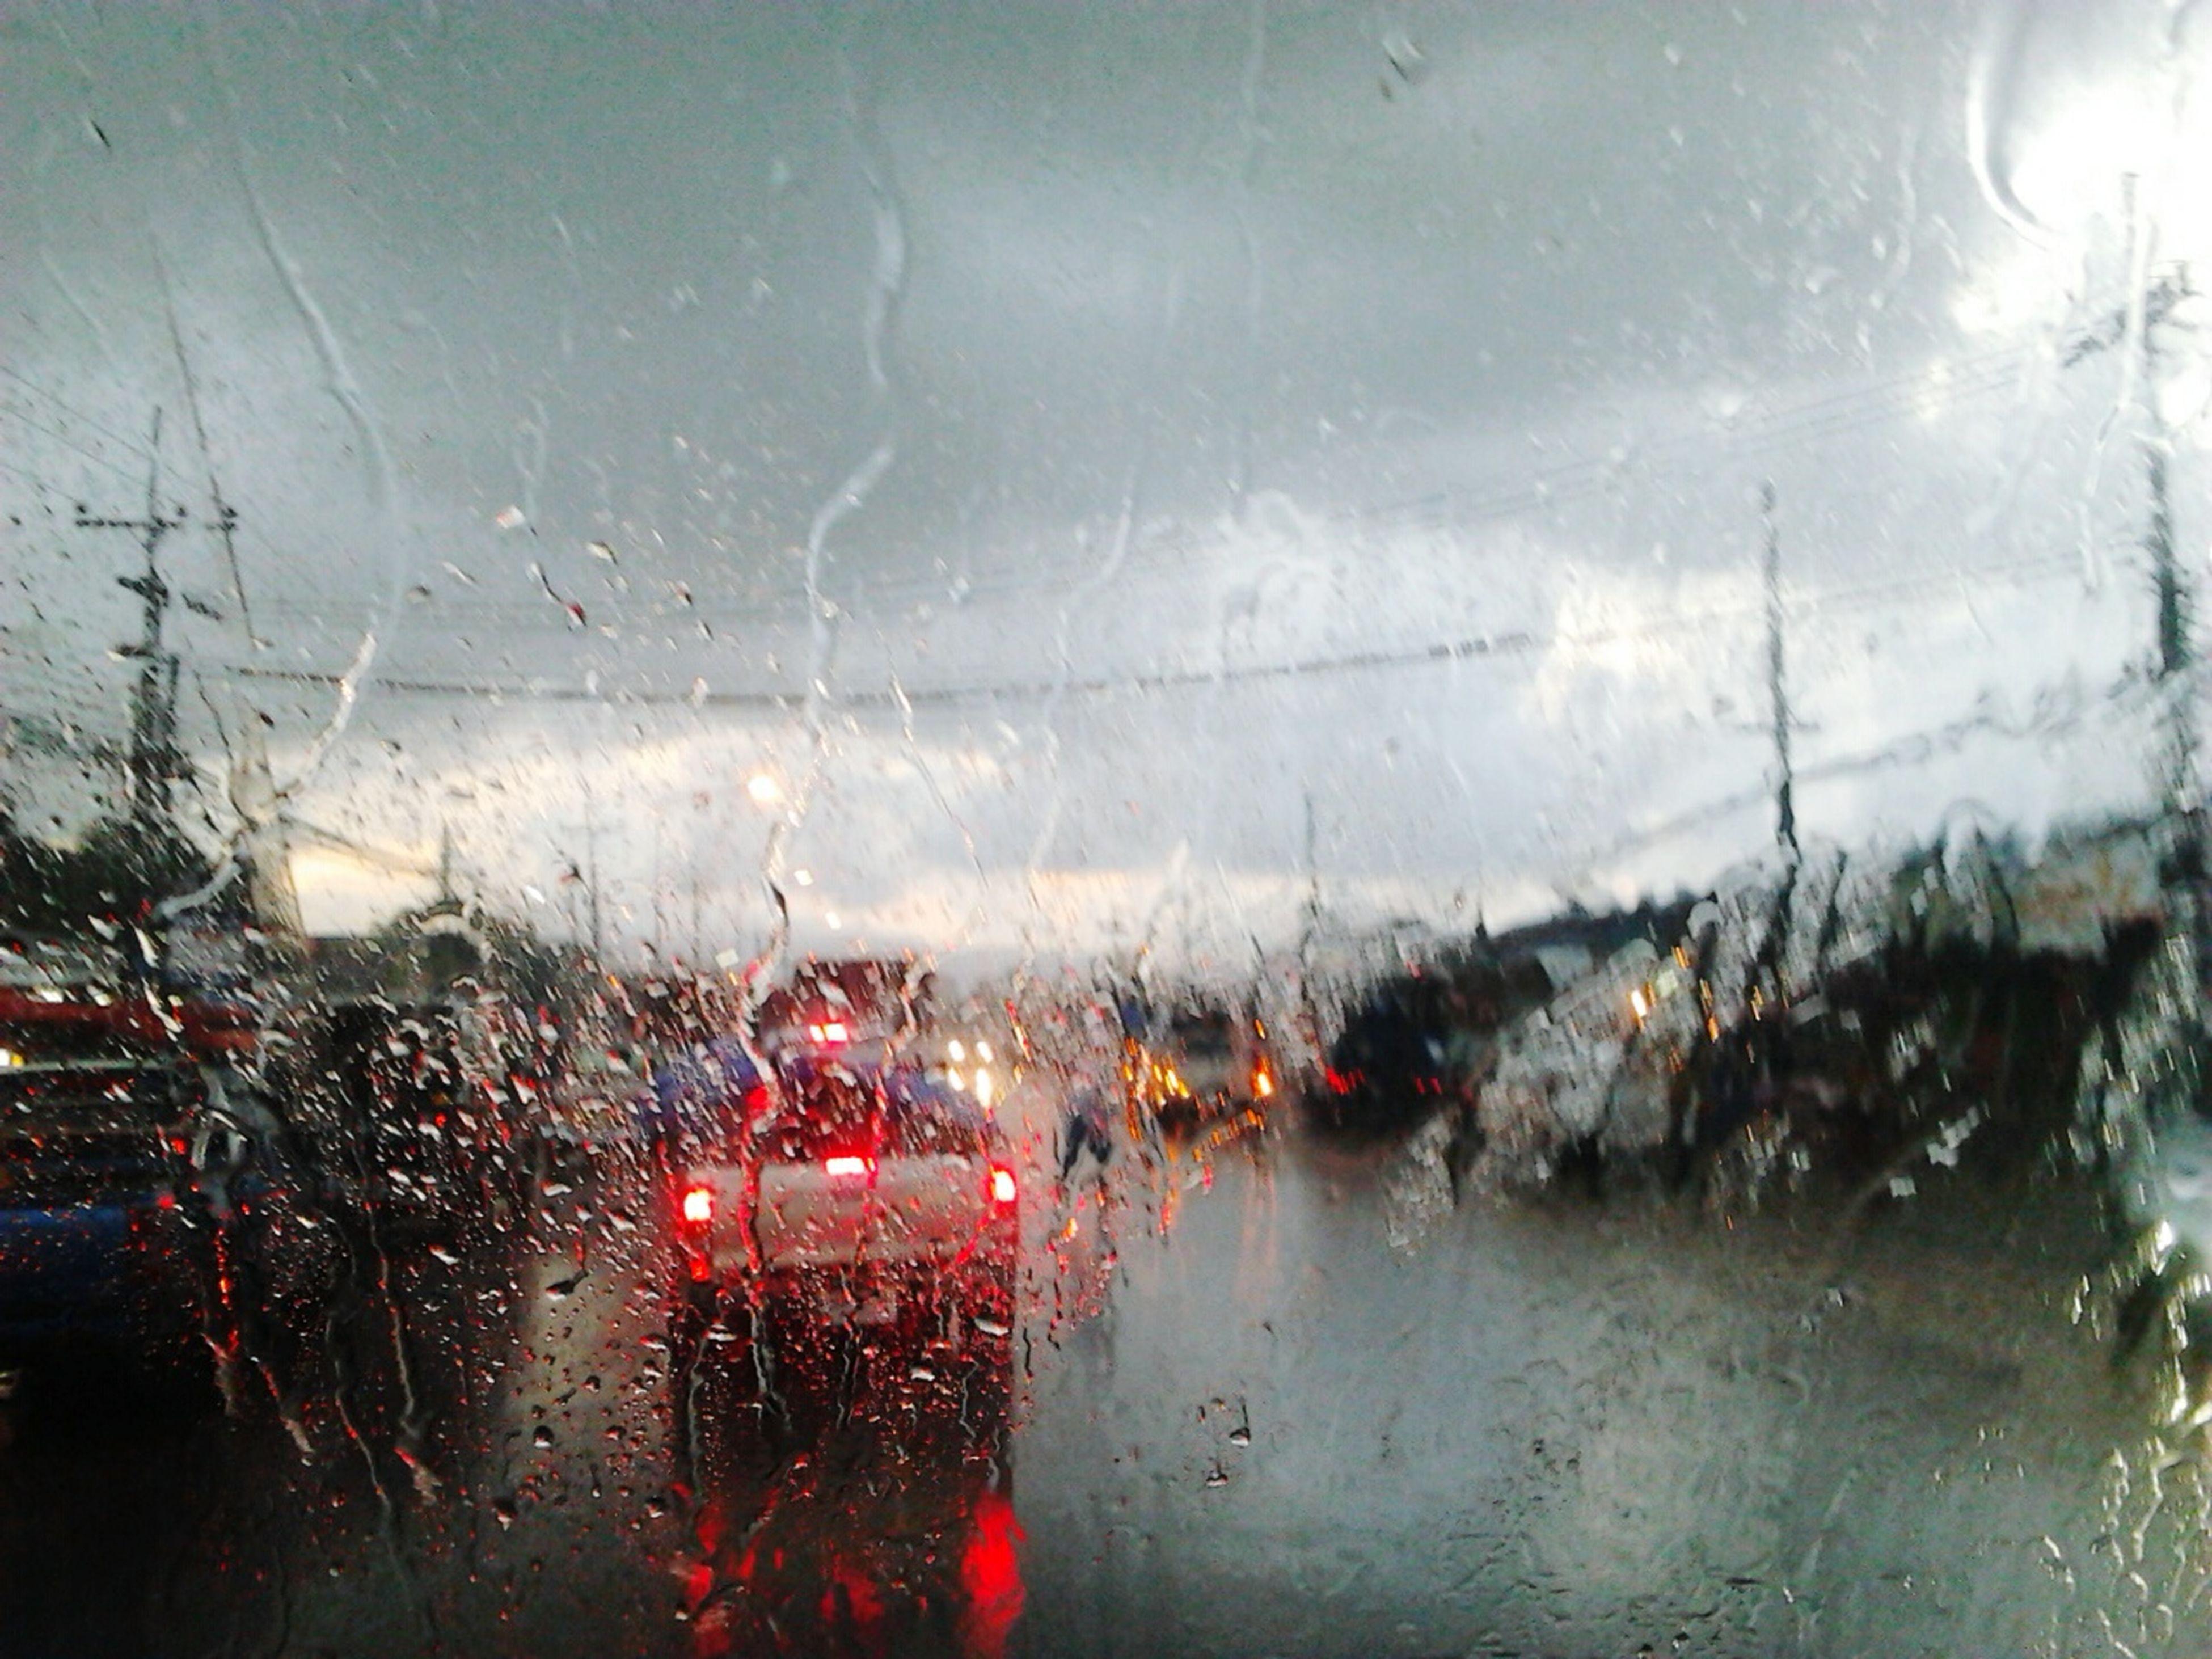 wet, drop, rain, water, window, transparent, weather, glass - material, indoors, raindrop, season, monsoon, sky, car, vehicle interior, rainy season, glass, transportation, land vehicle, full frame